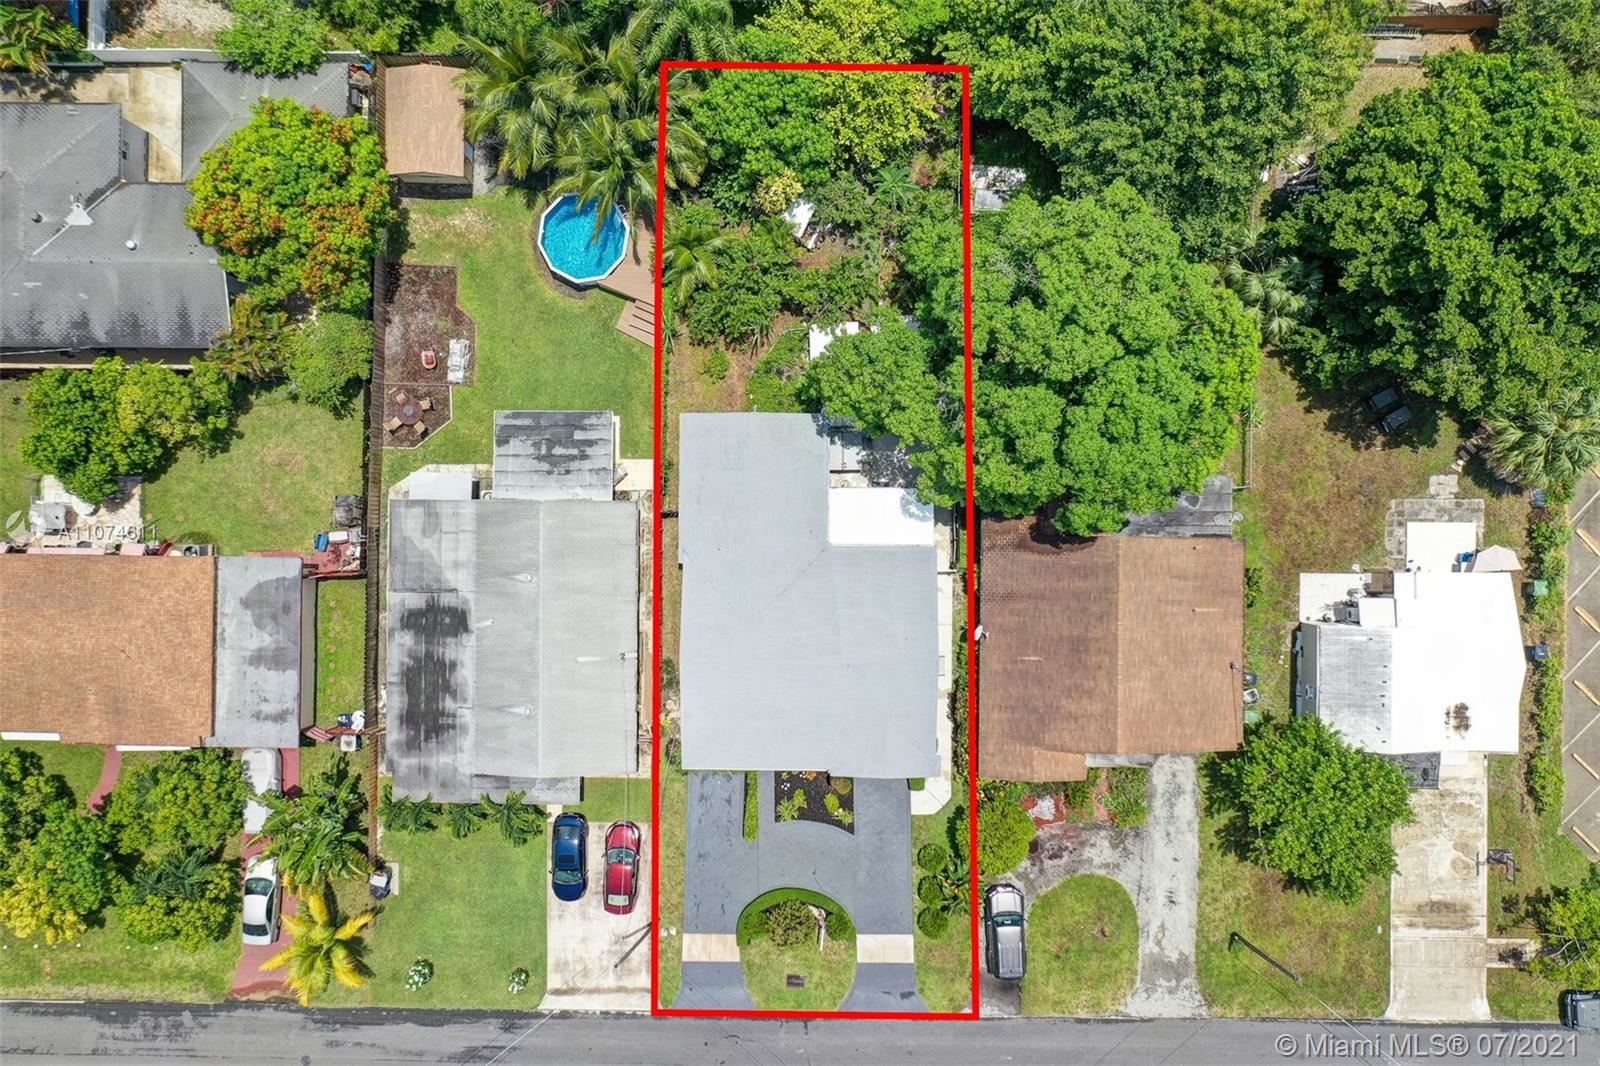 Photo of 213 SW 2nd Ave, Hallandale Beach, FL 33009 (MLS # A11074611)